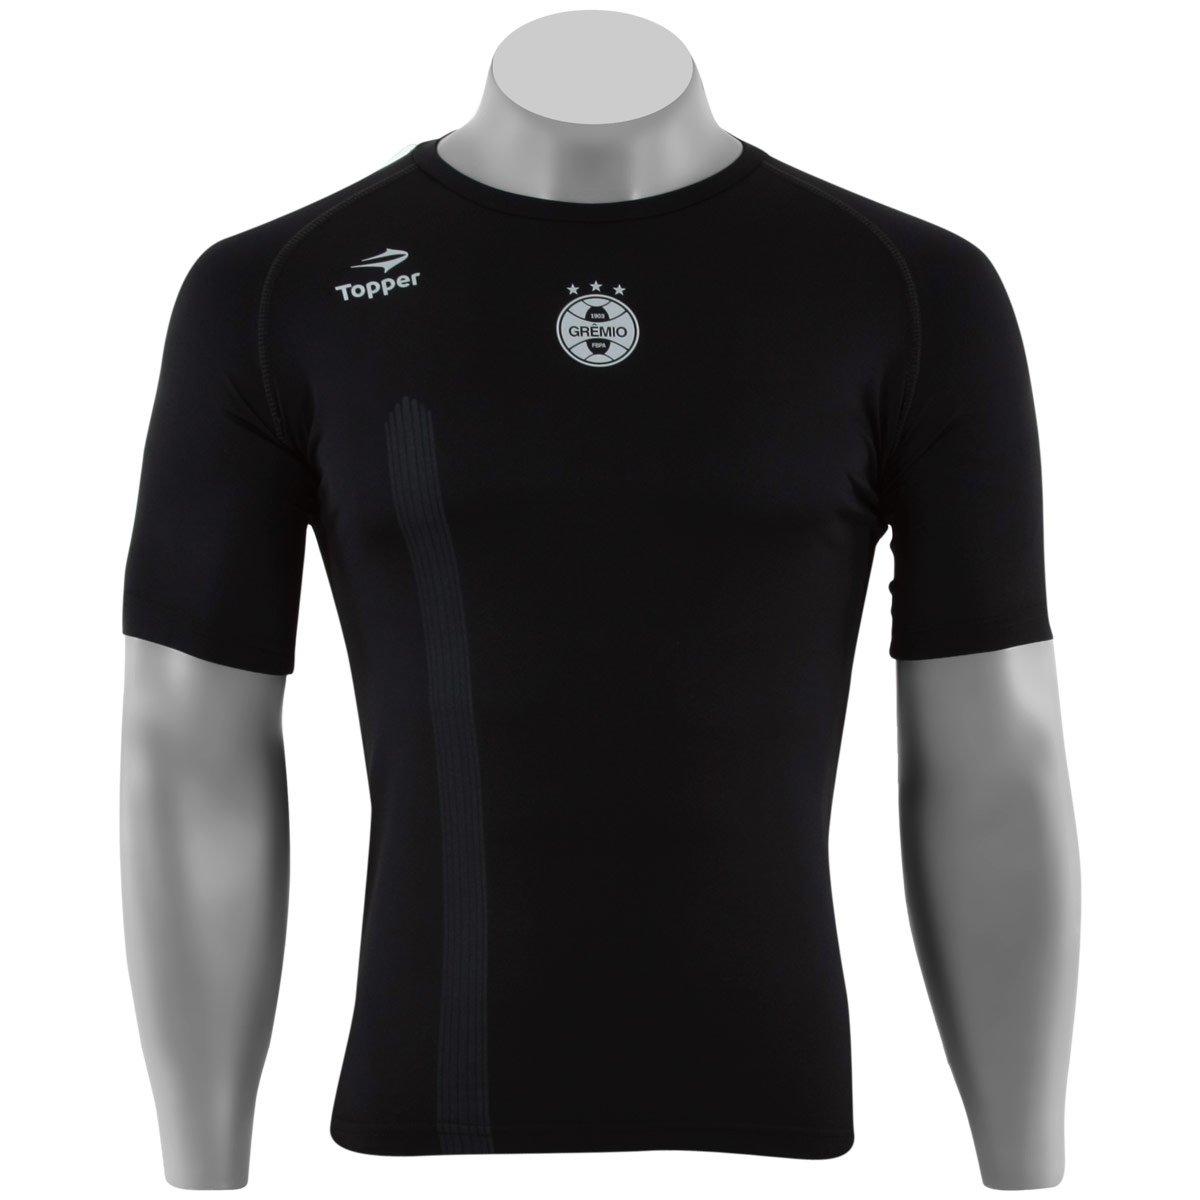 Camisa Topper Grêmio Bodywear - Compre Agora  f06cb8f27ecf3